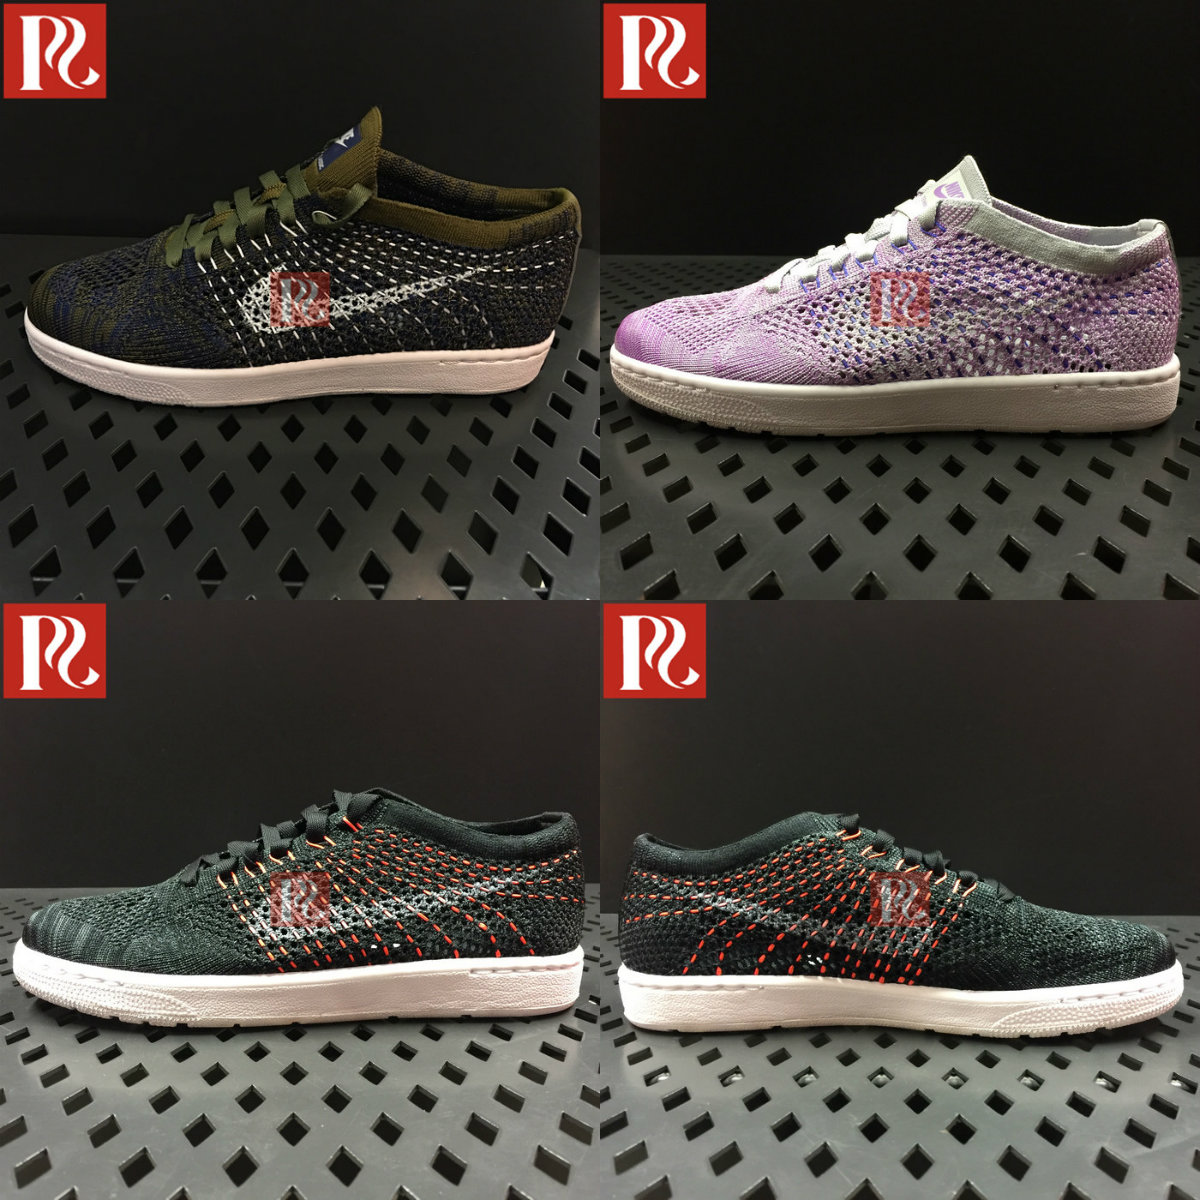 NIKEナイキコーナーの規格品女子飛線編みスポーツレジャー靴833860-301